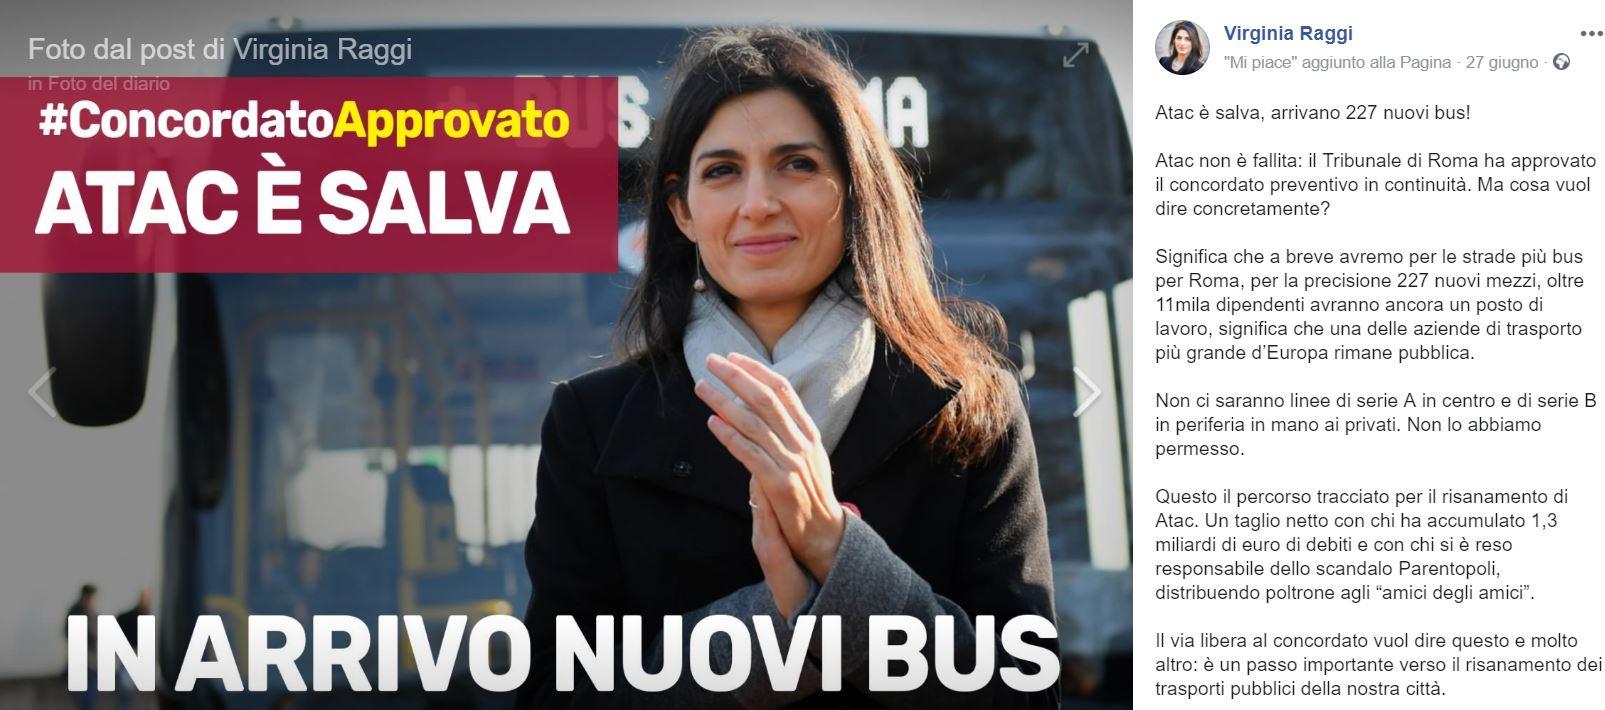 virginia raggi autobus 1